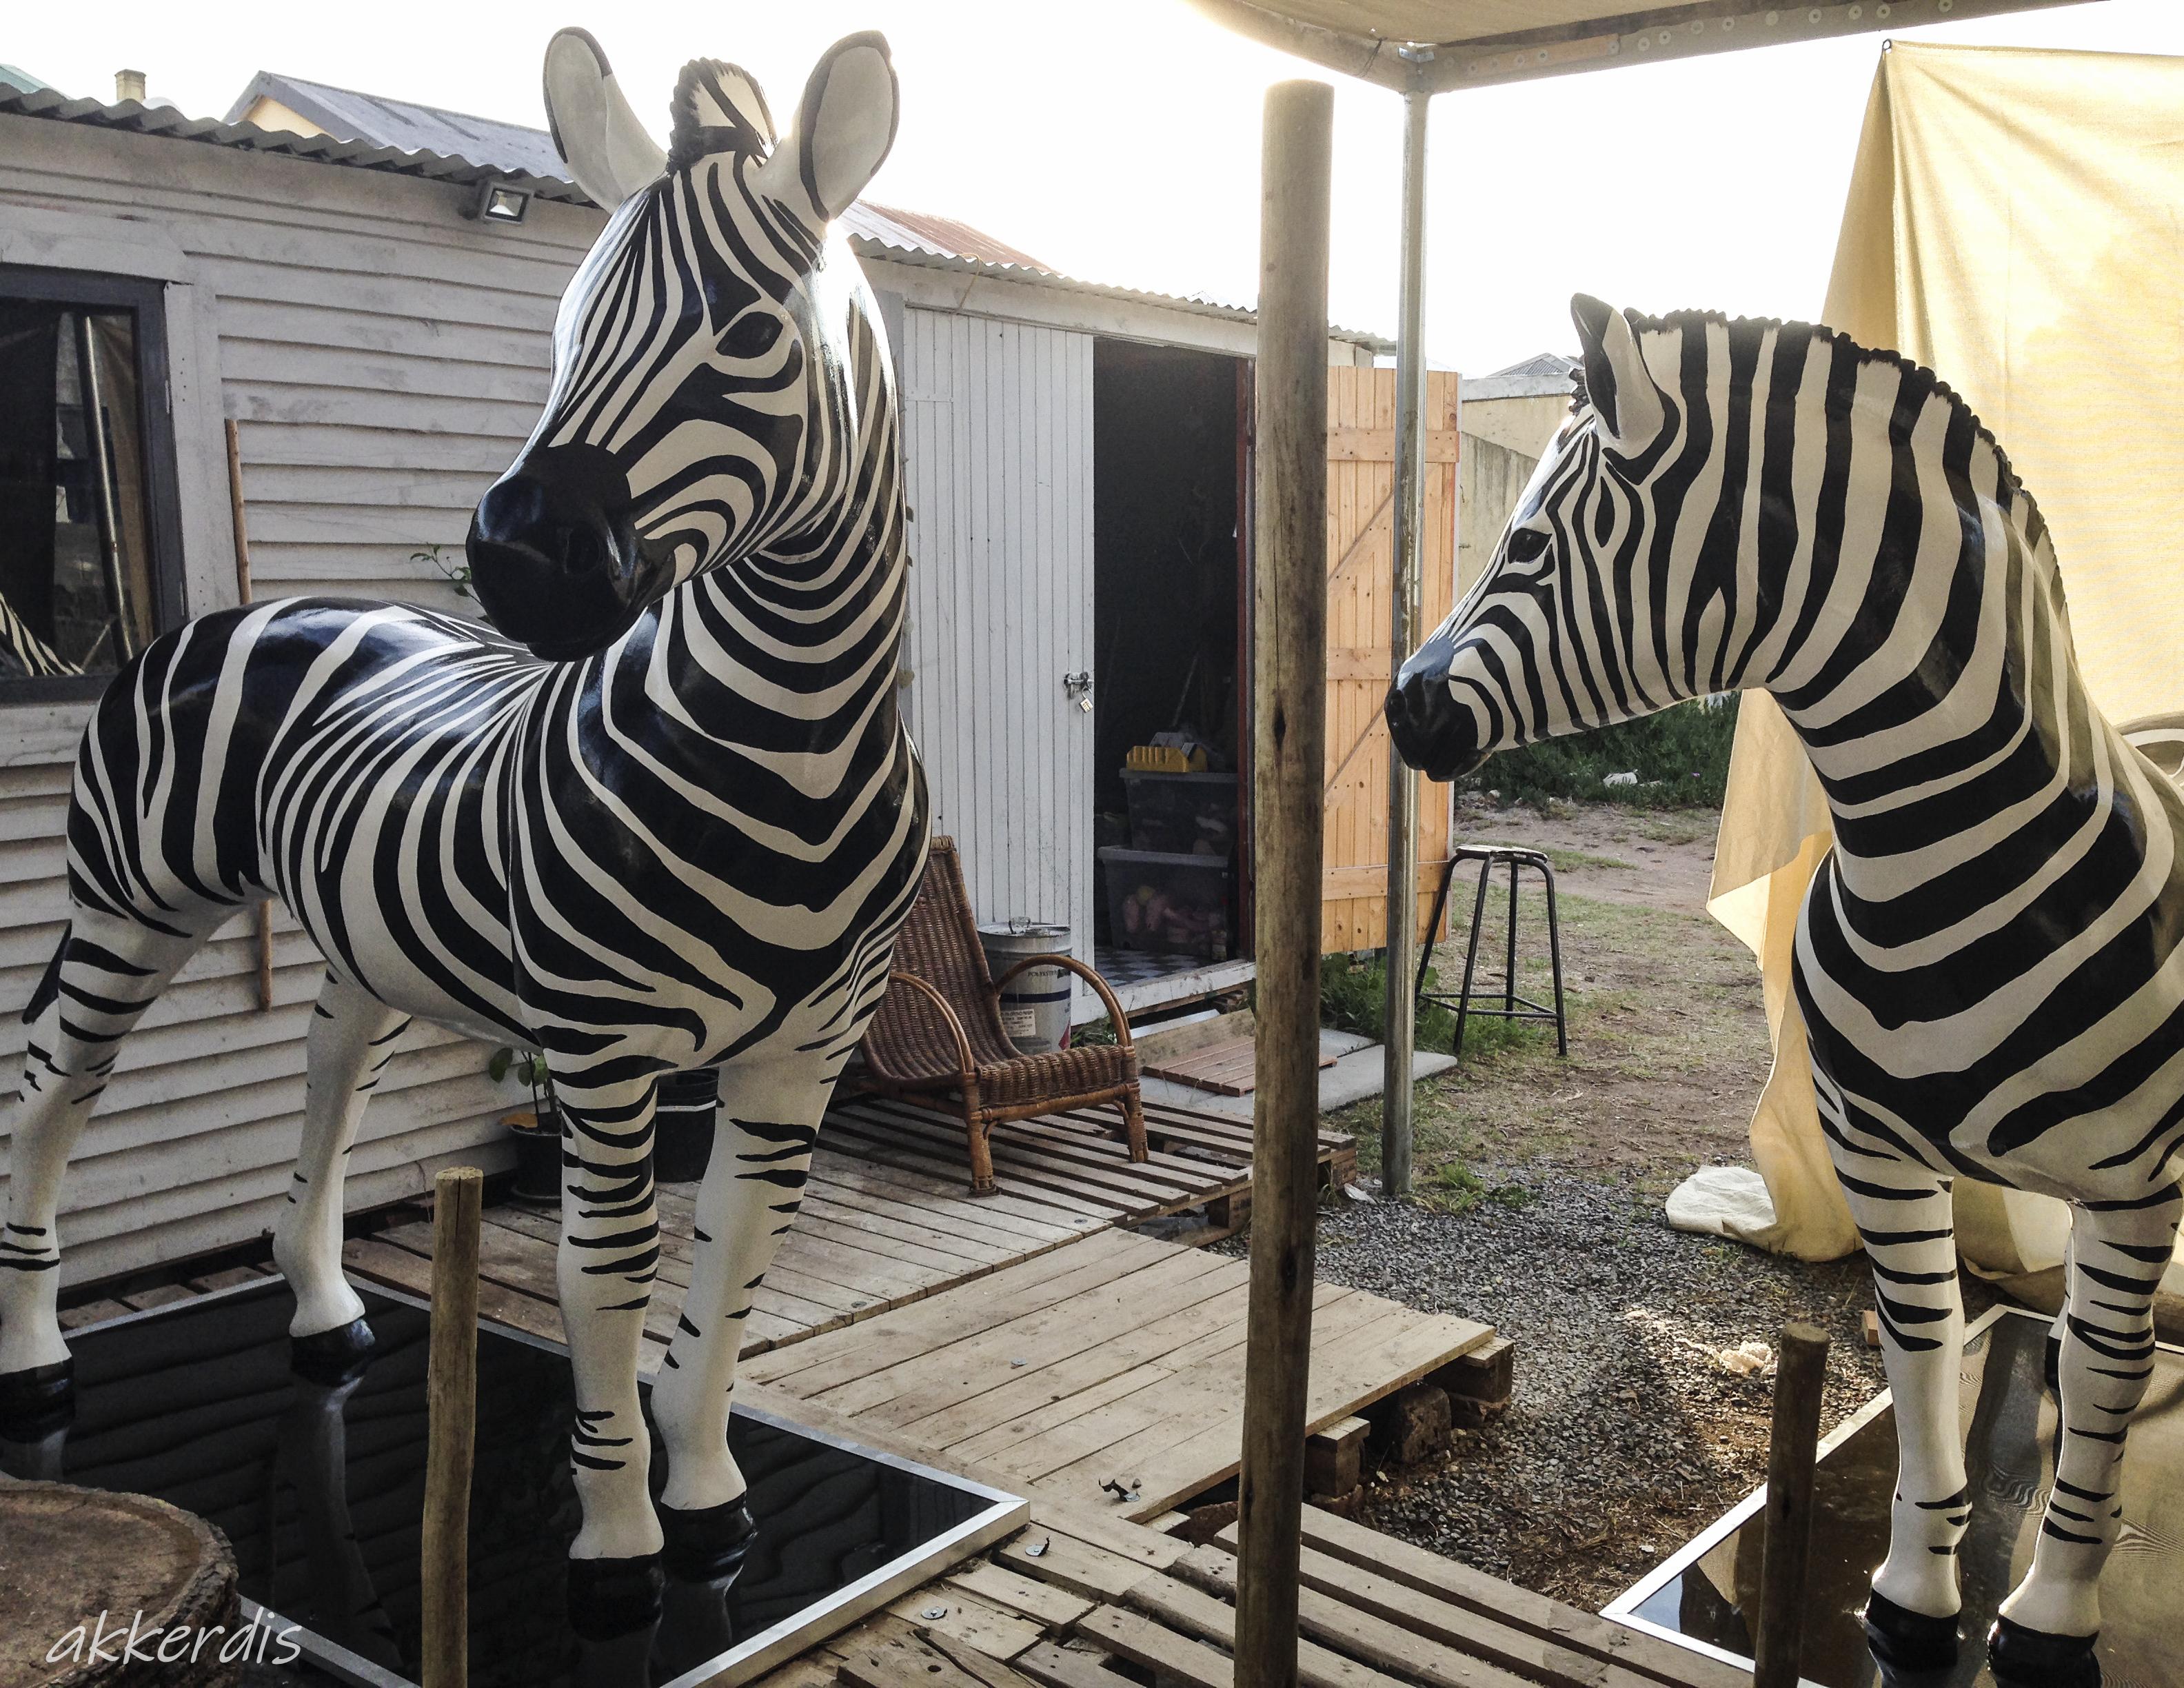 fabricated zebras